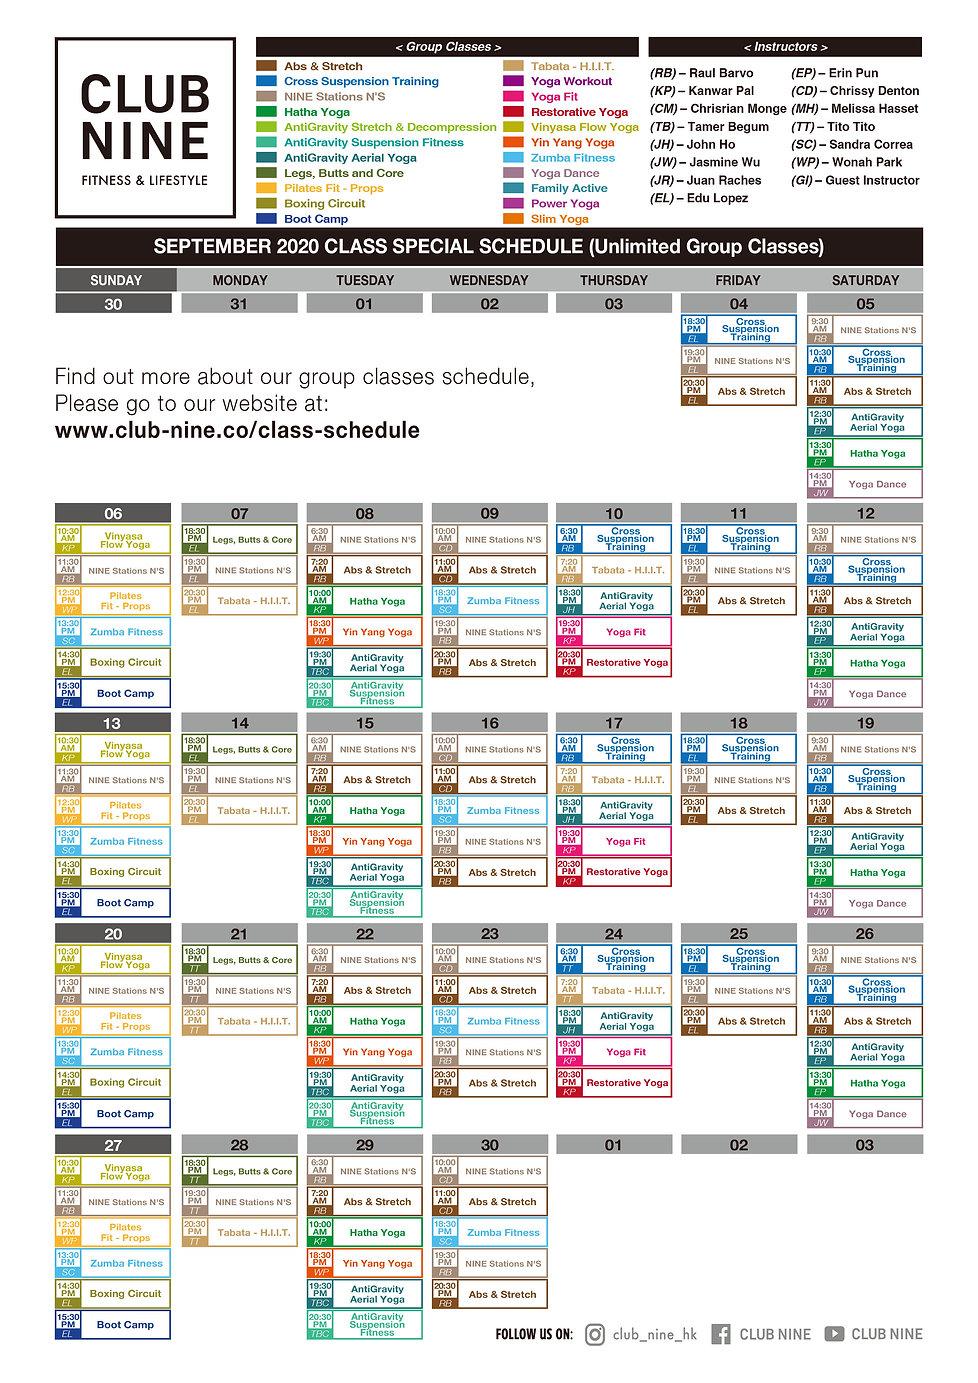 CN_Schedule_September_2020.jpg